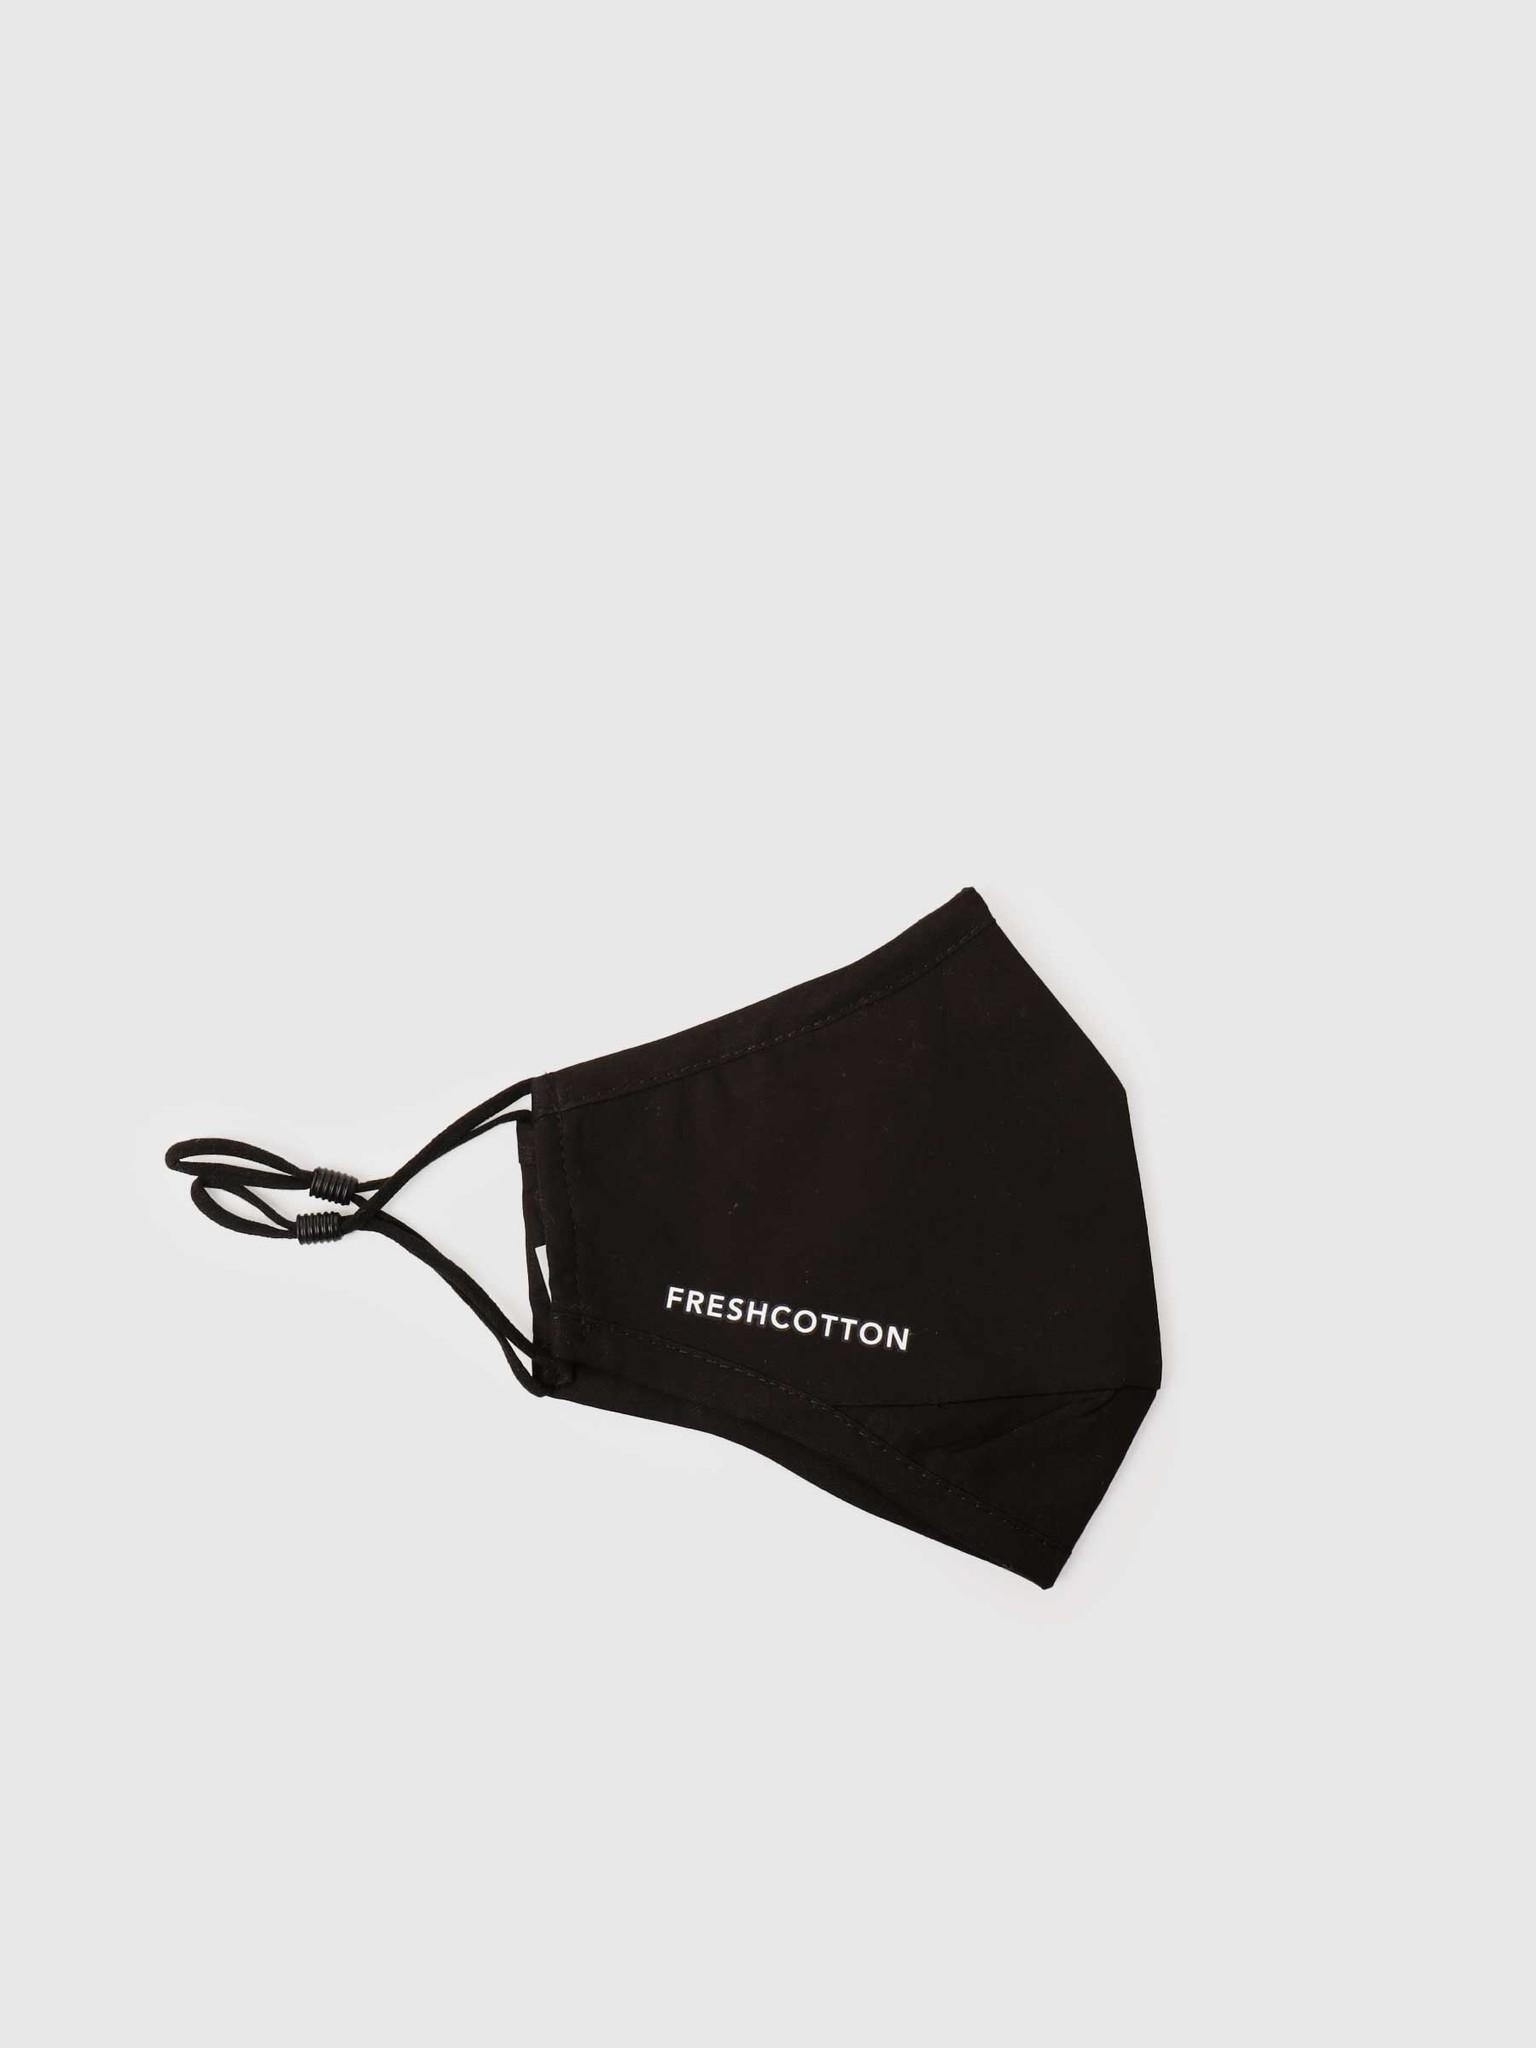 FRESHCOTTON FreshCotton Logo Facemask Black